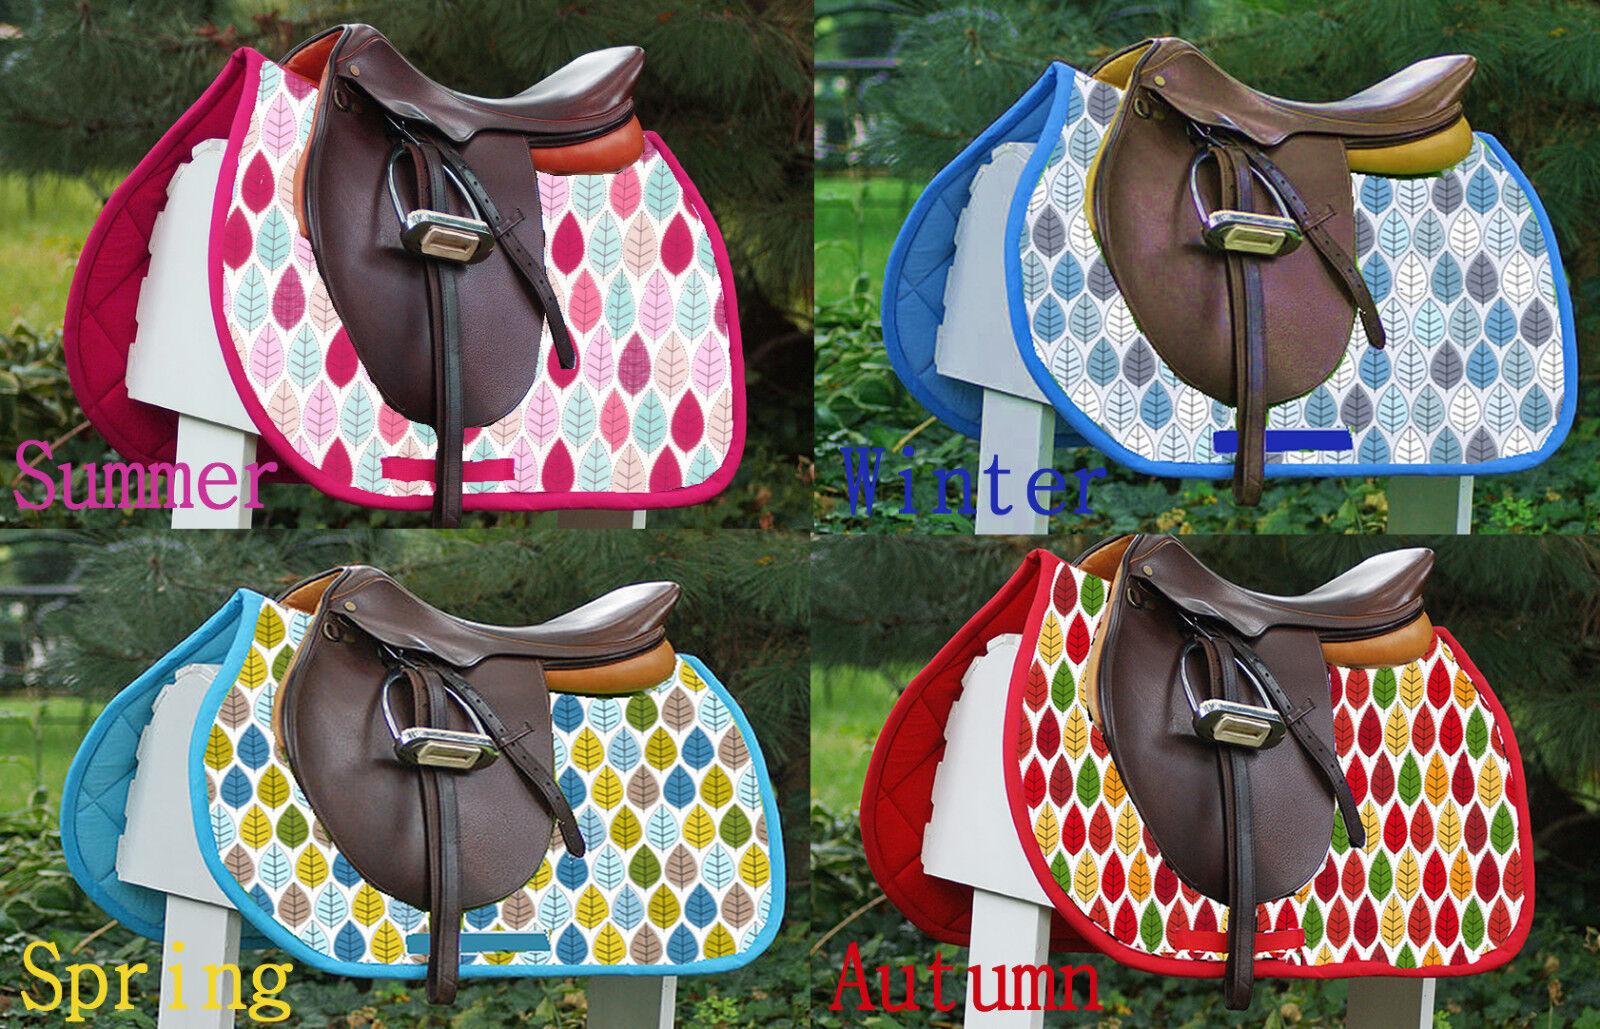 New Horse Saddle Pad Numnah '4 Seasons' Printed Pattern Pony Cob Full Unique